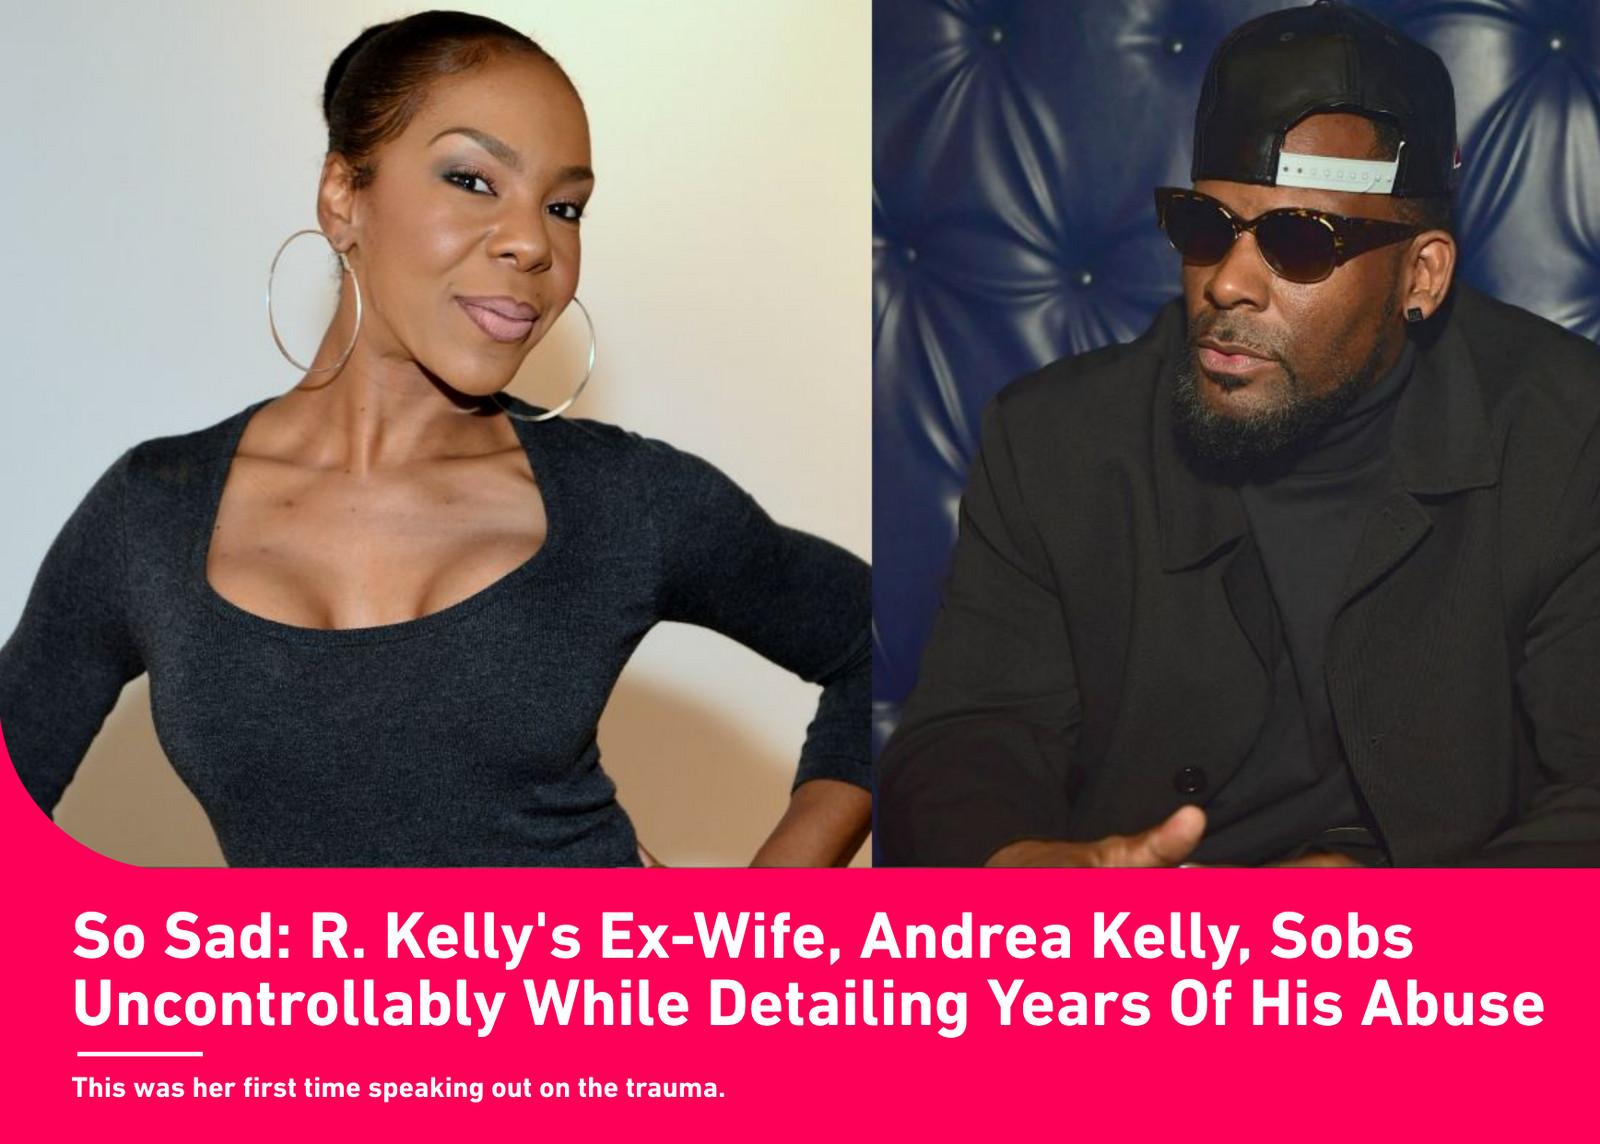 R kelly sex tape details